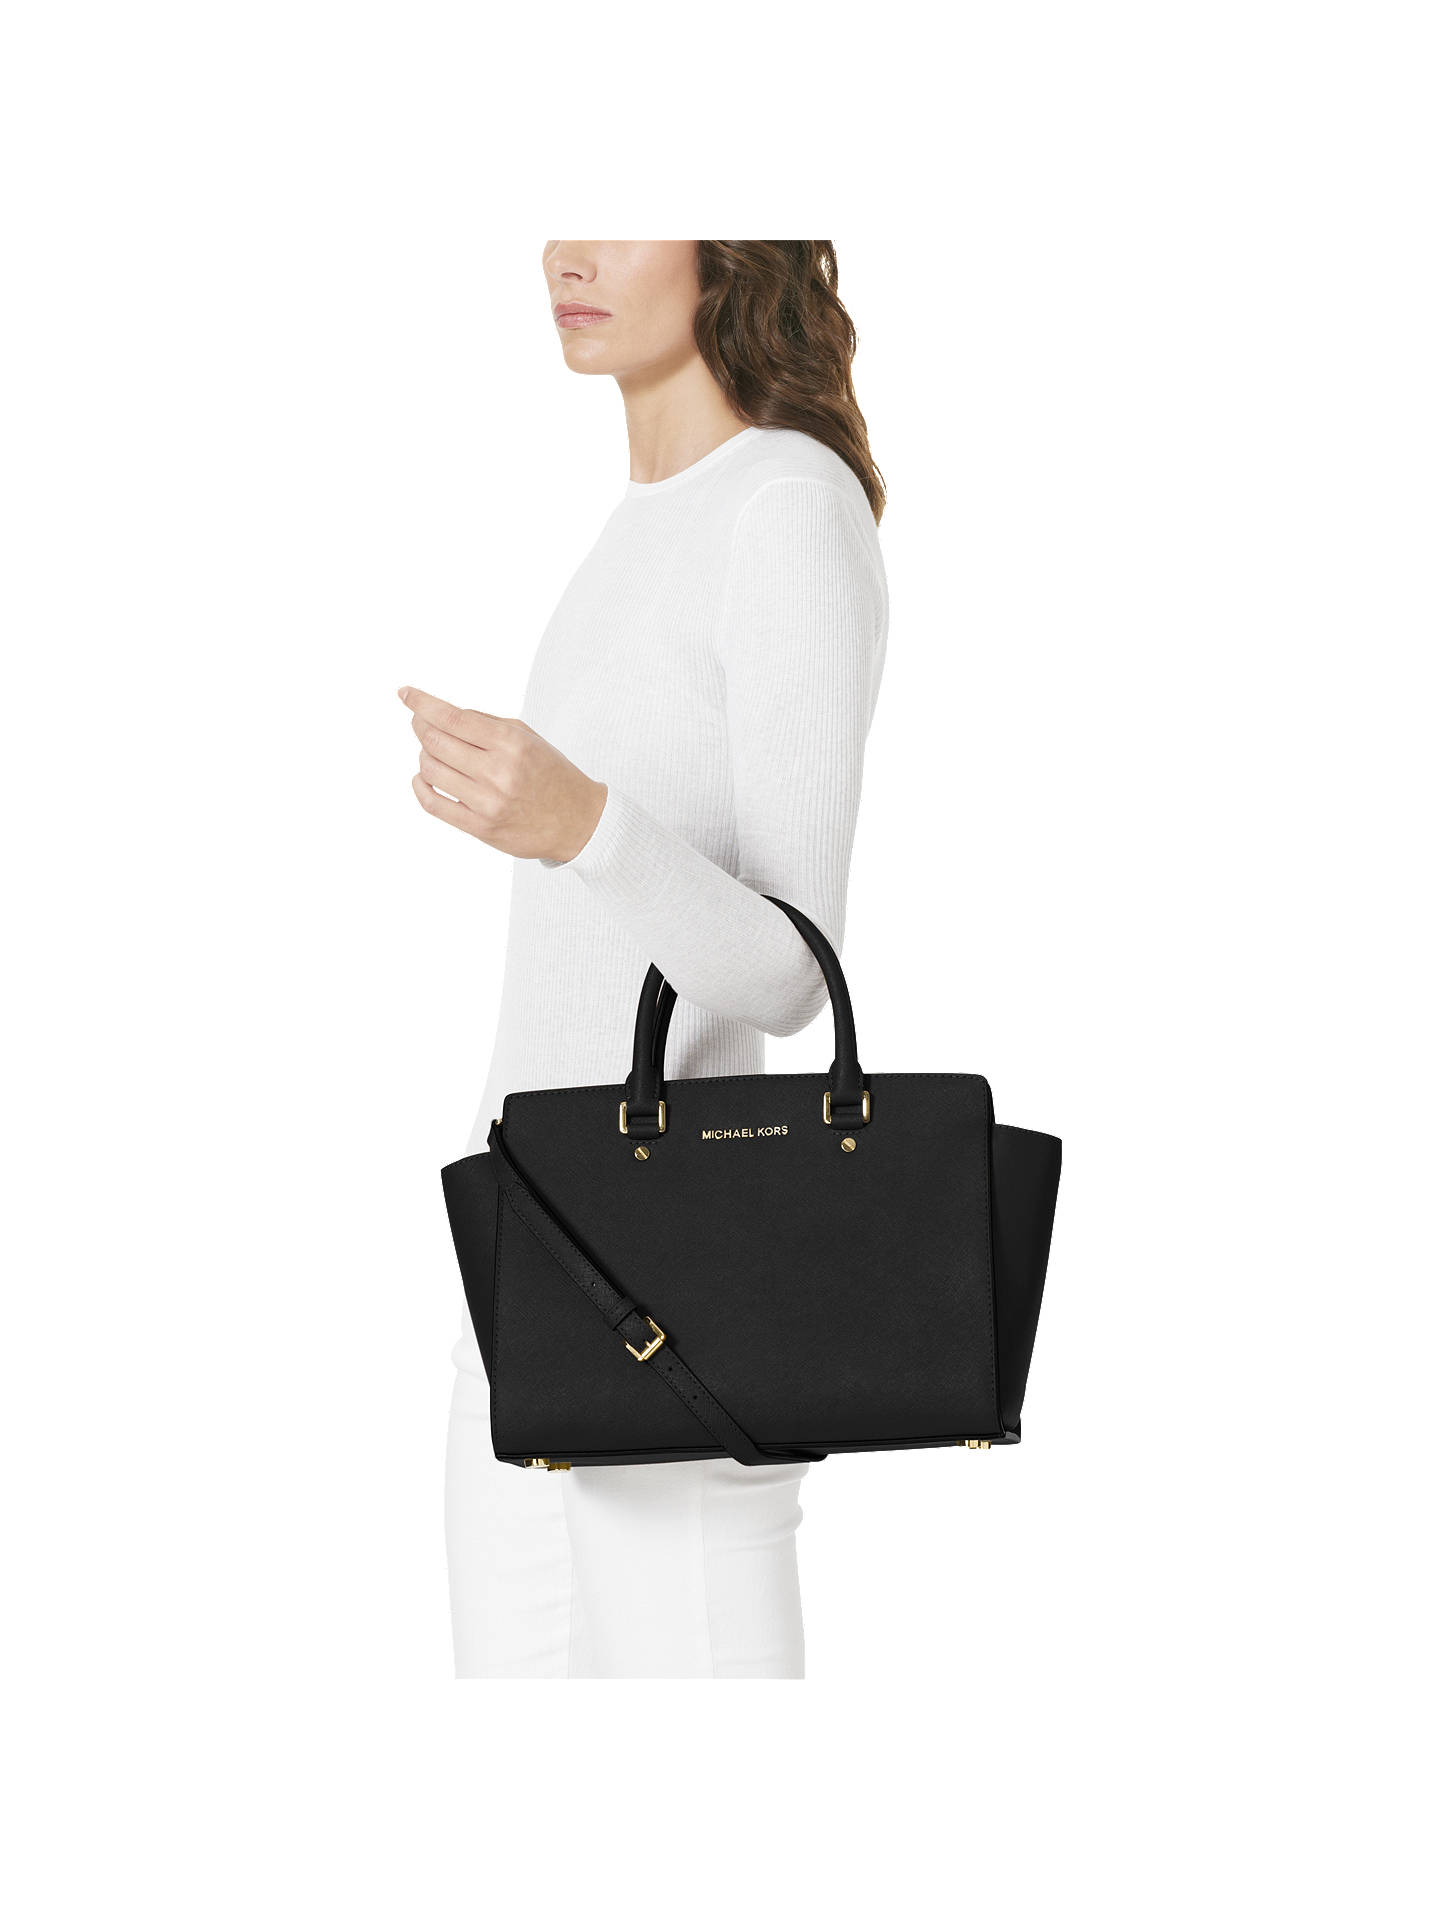 d461465897e902 ... Buy MICHAEL Michael Kors Selma Leather Satchel Bag, Black Online at  johnlewis.com